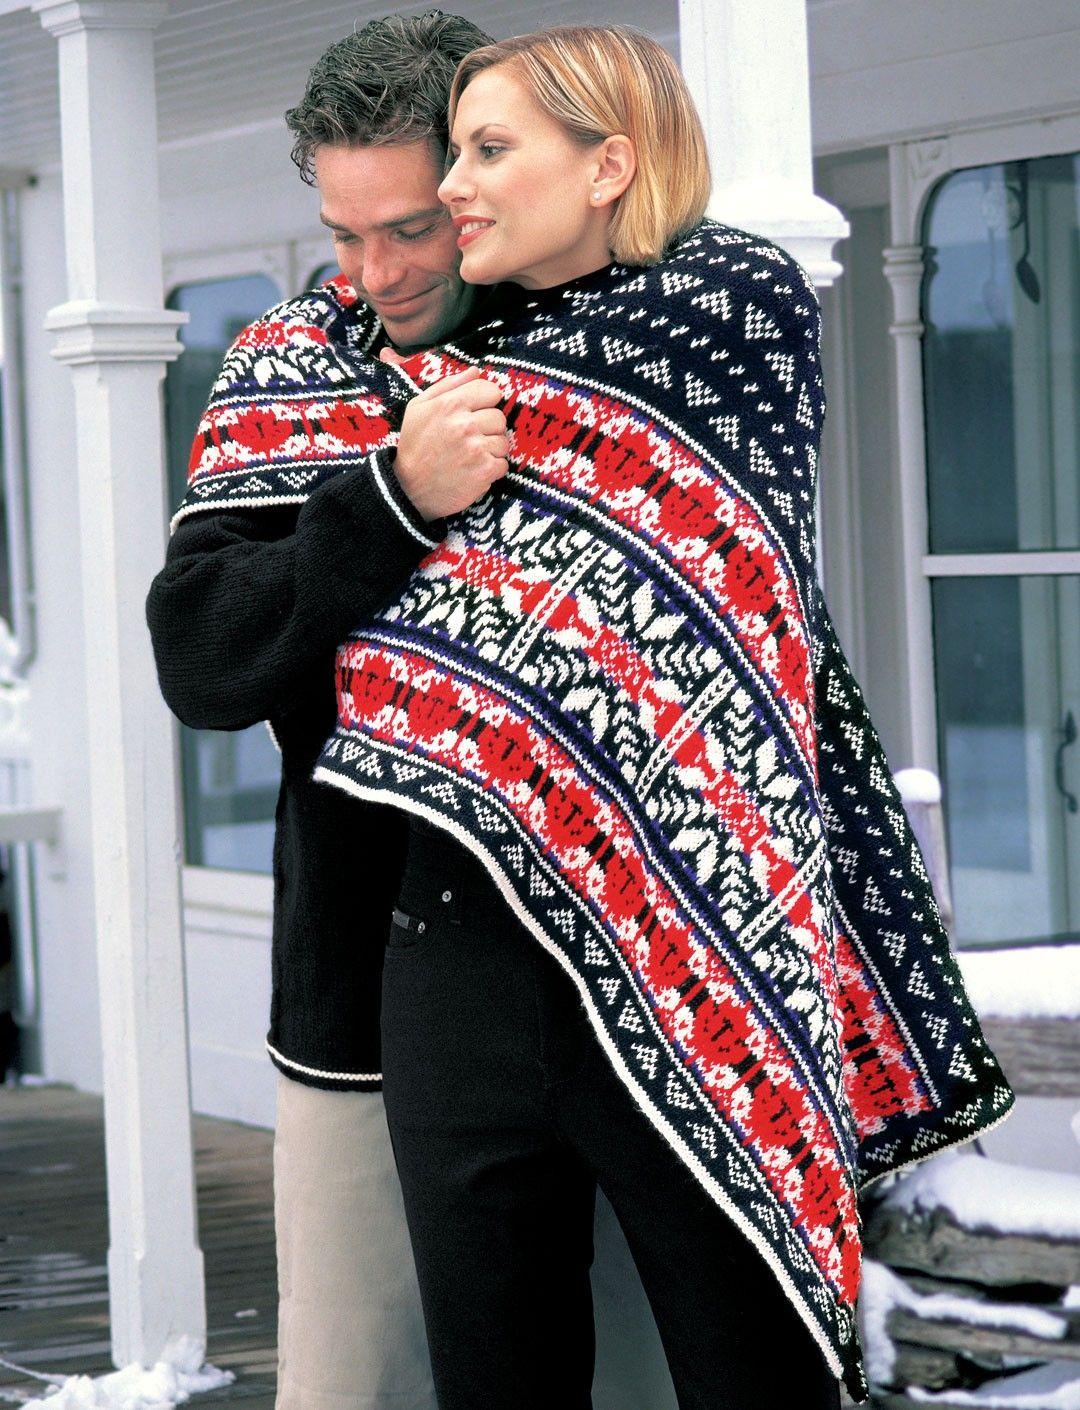 Nordic Lap Blanket - Patterns | Yarnspirations | Blanket ...